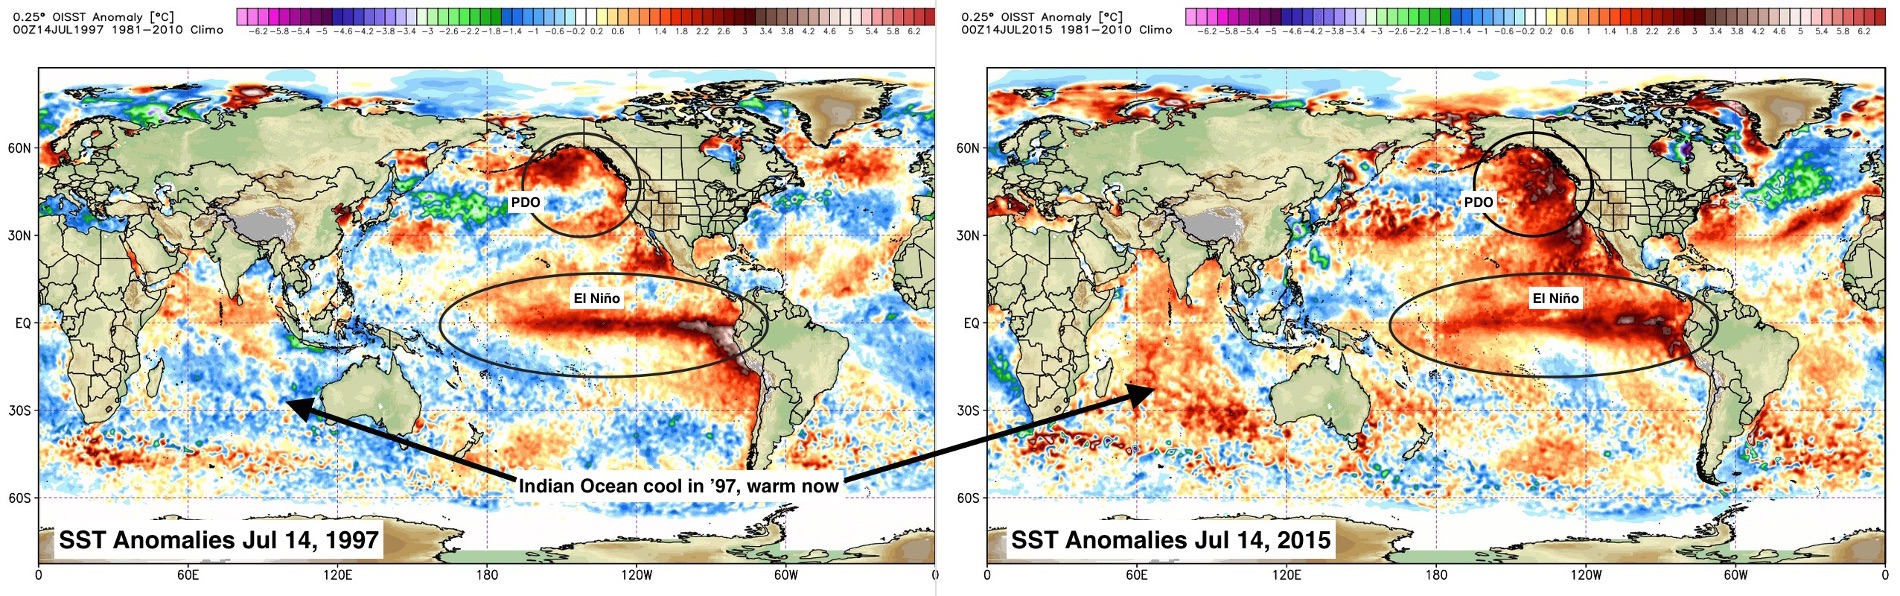 1997 - 2015 SST comparison | WeatherBell Analytics